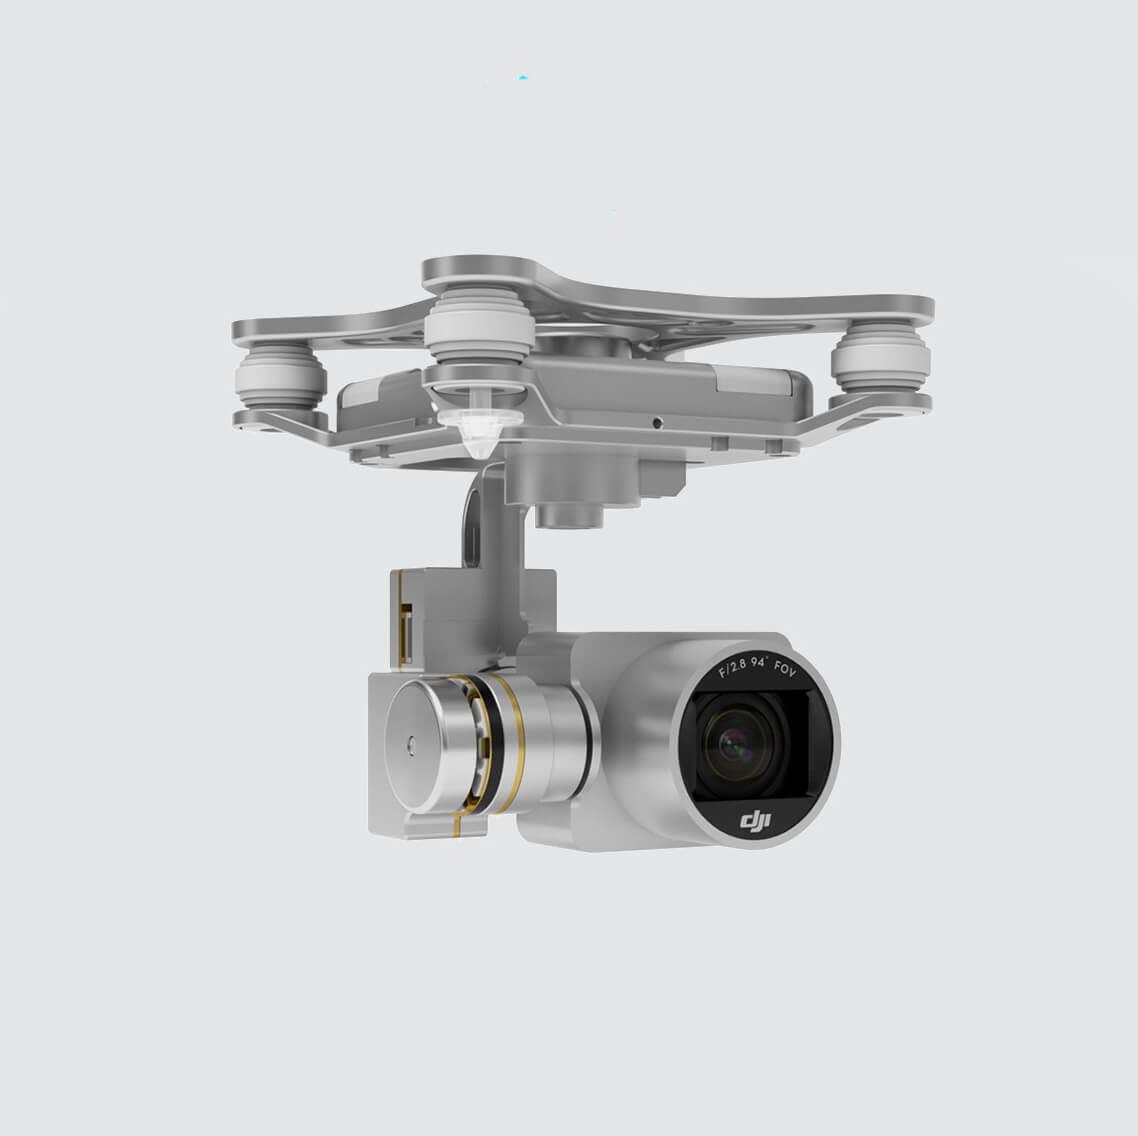 DJI Phantom 3 Standard Quadcopter Drone (DJI Refurbished Unit)